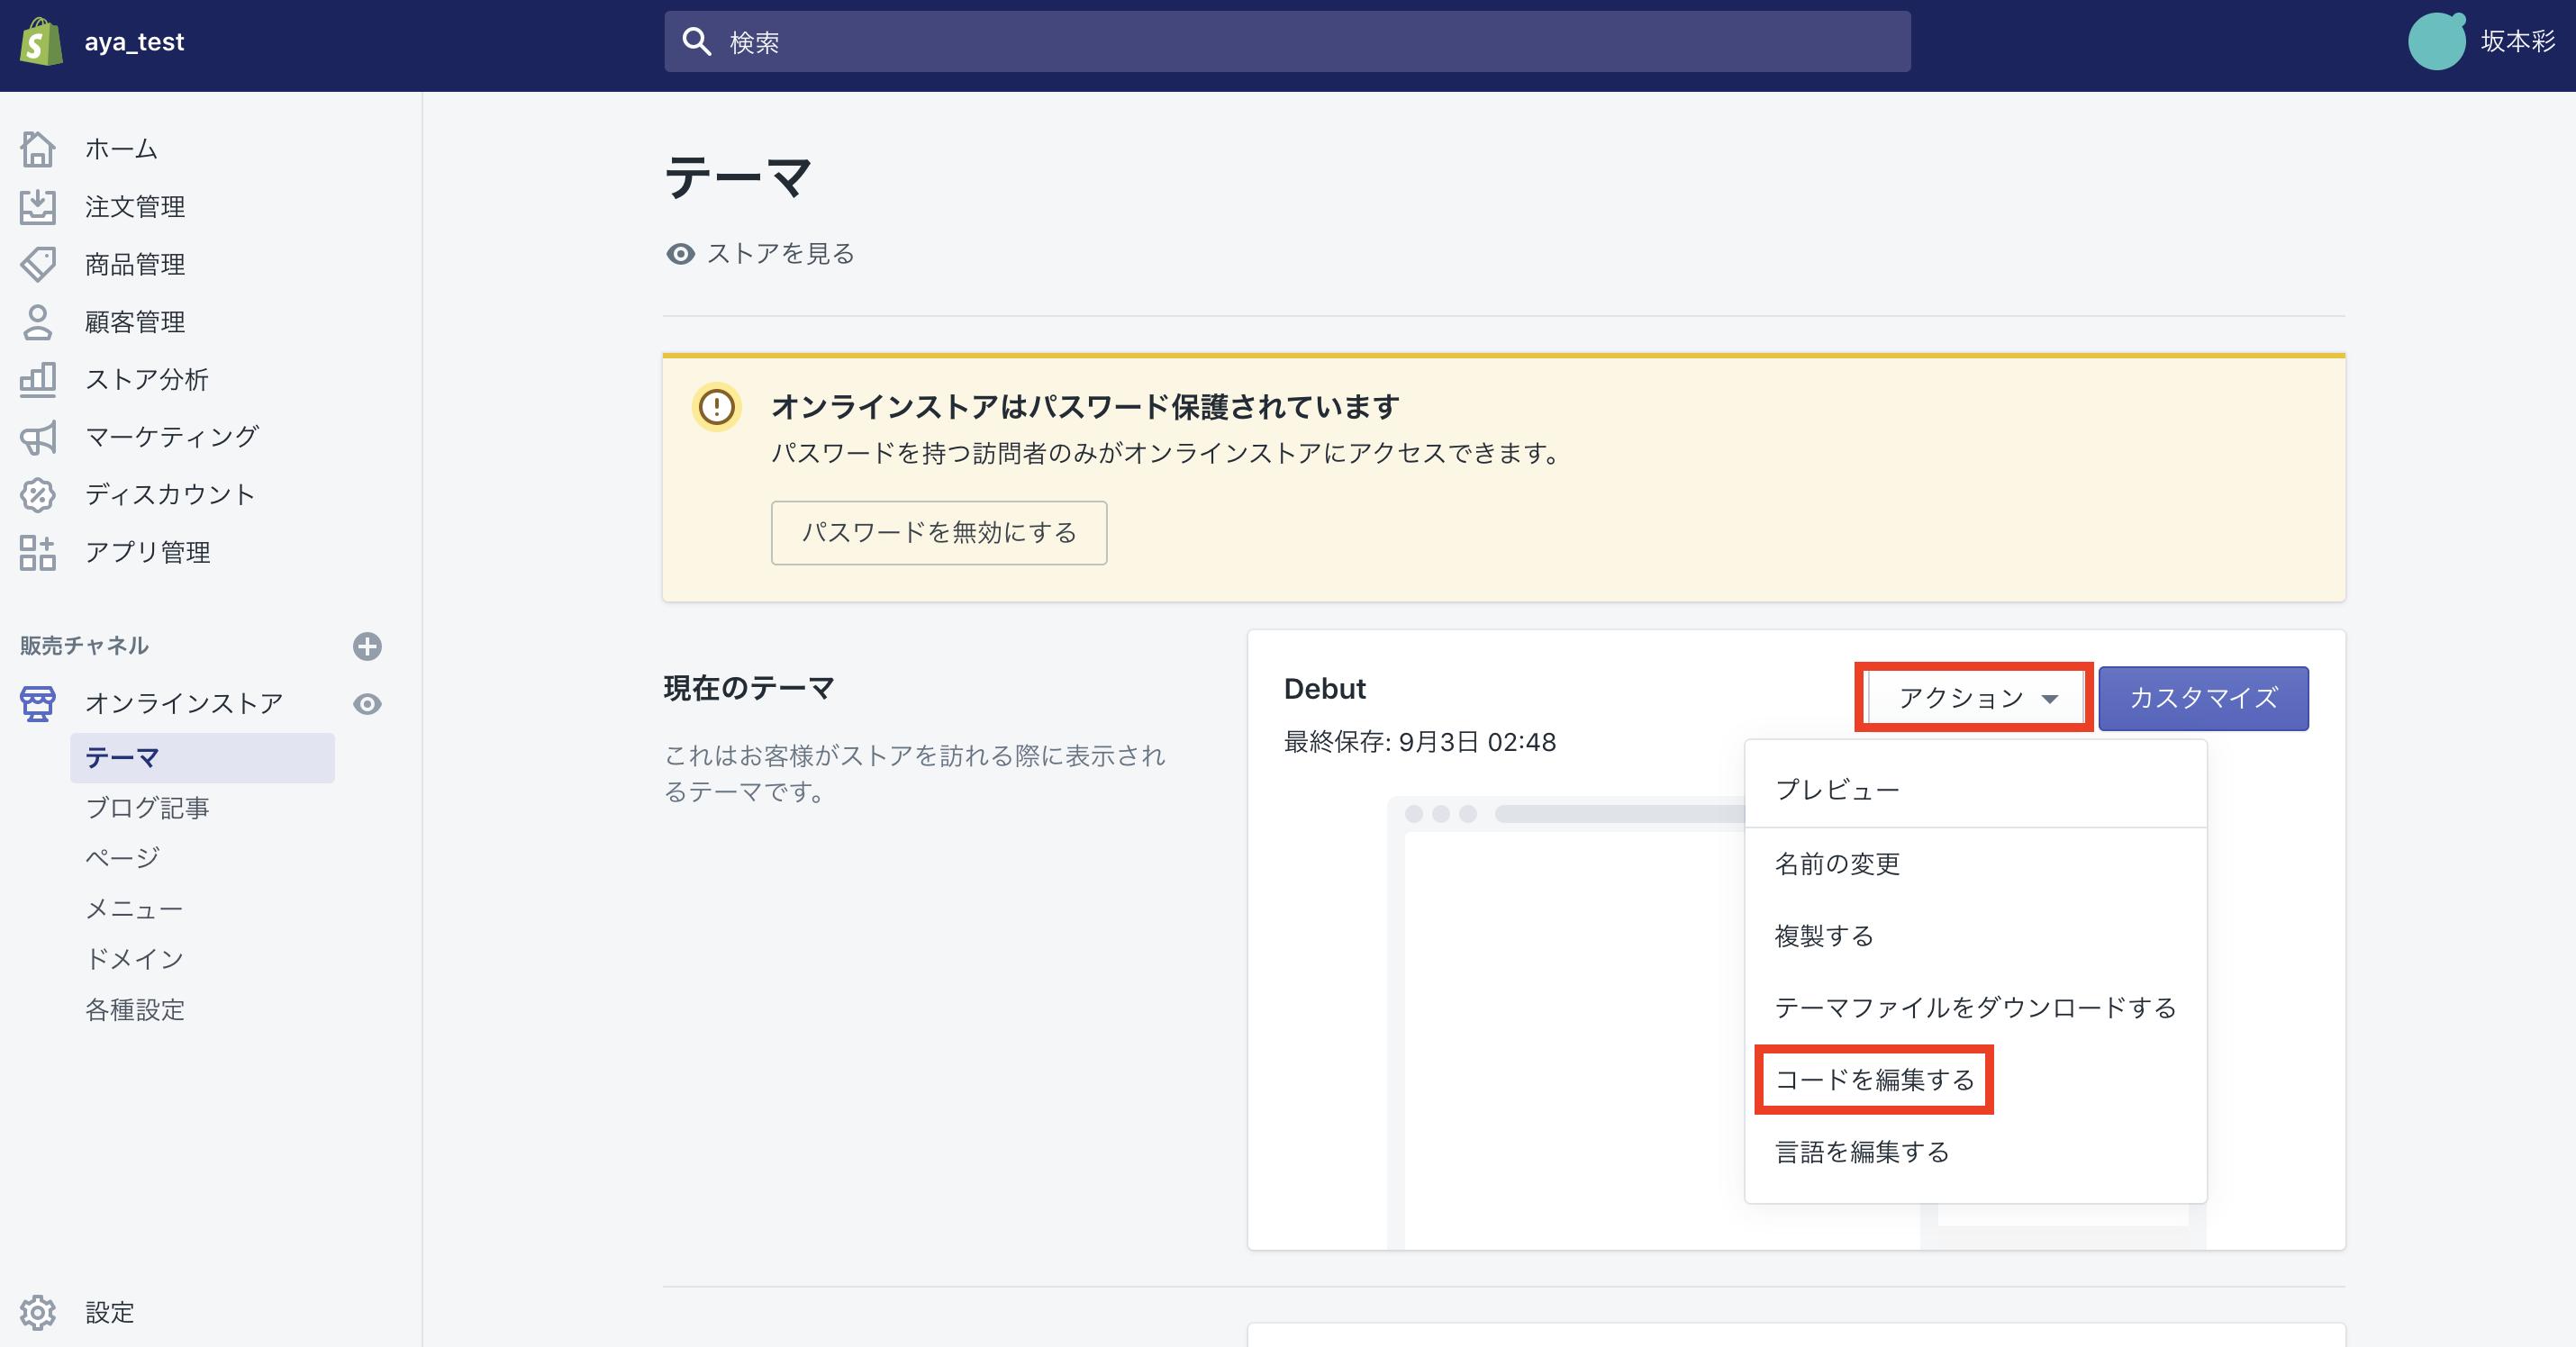 Shopifyのオンラインストア>テーマ>現在のテーマのアクション>コードを編集するをクリック